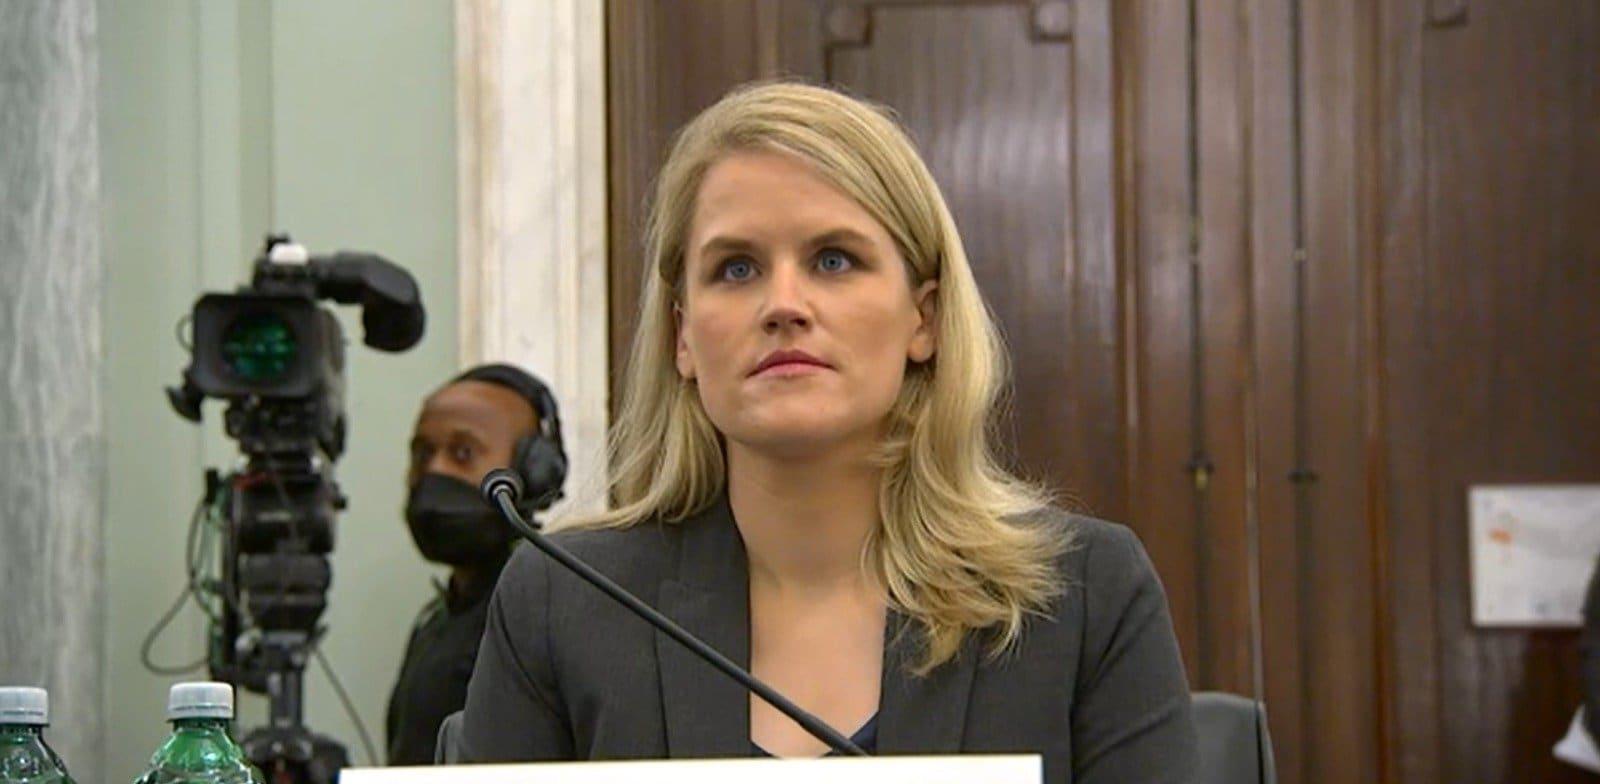 פרנסיס האוגן מעידה בפני הסנאט / צילום: צילום מסך